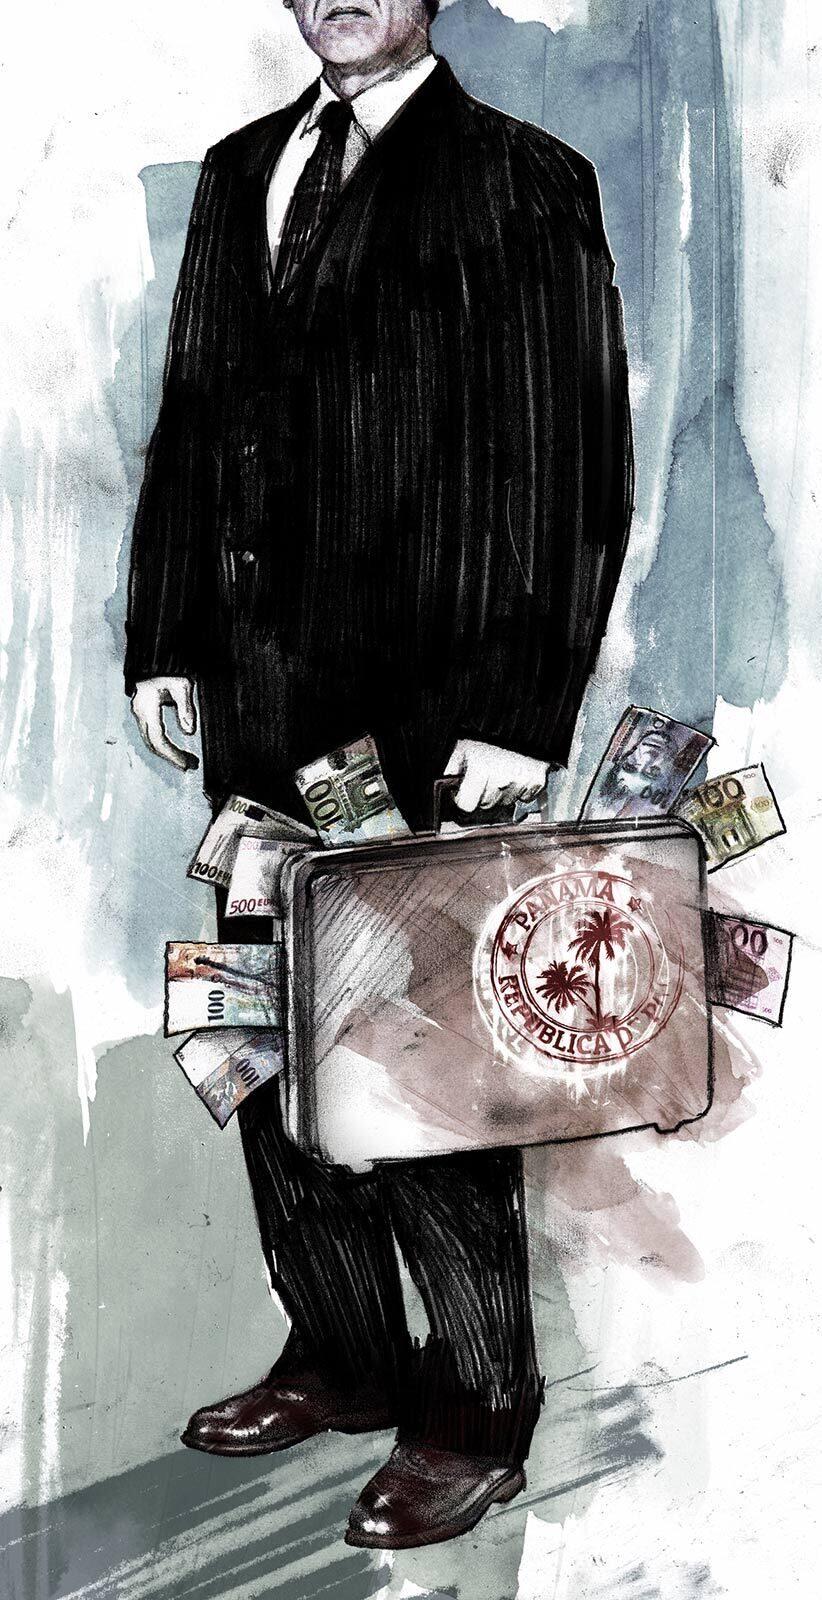 Panama Papers editorial illustration - Kornel Illustration   Kornel Stadler portfolio